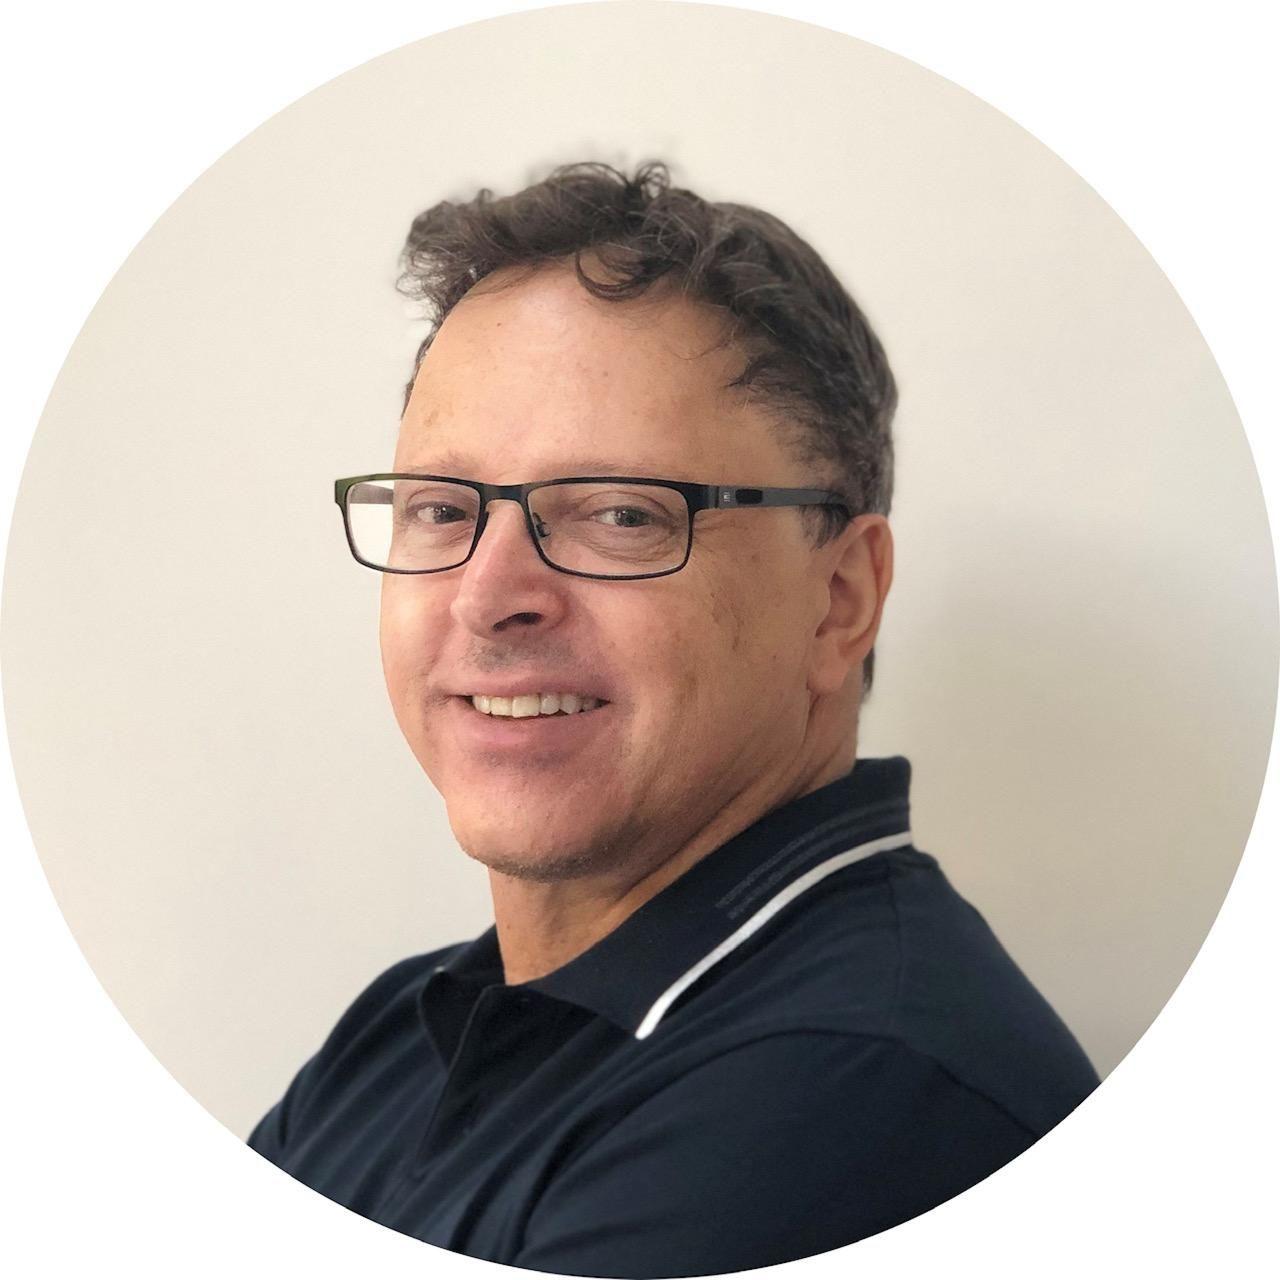 FORMER VISA UK CEO TO LAUNCH TRSTPAYS AT TTE